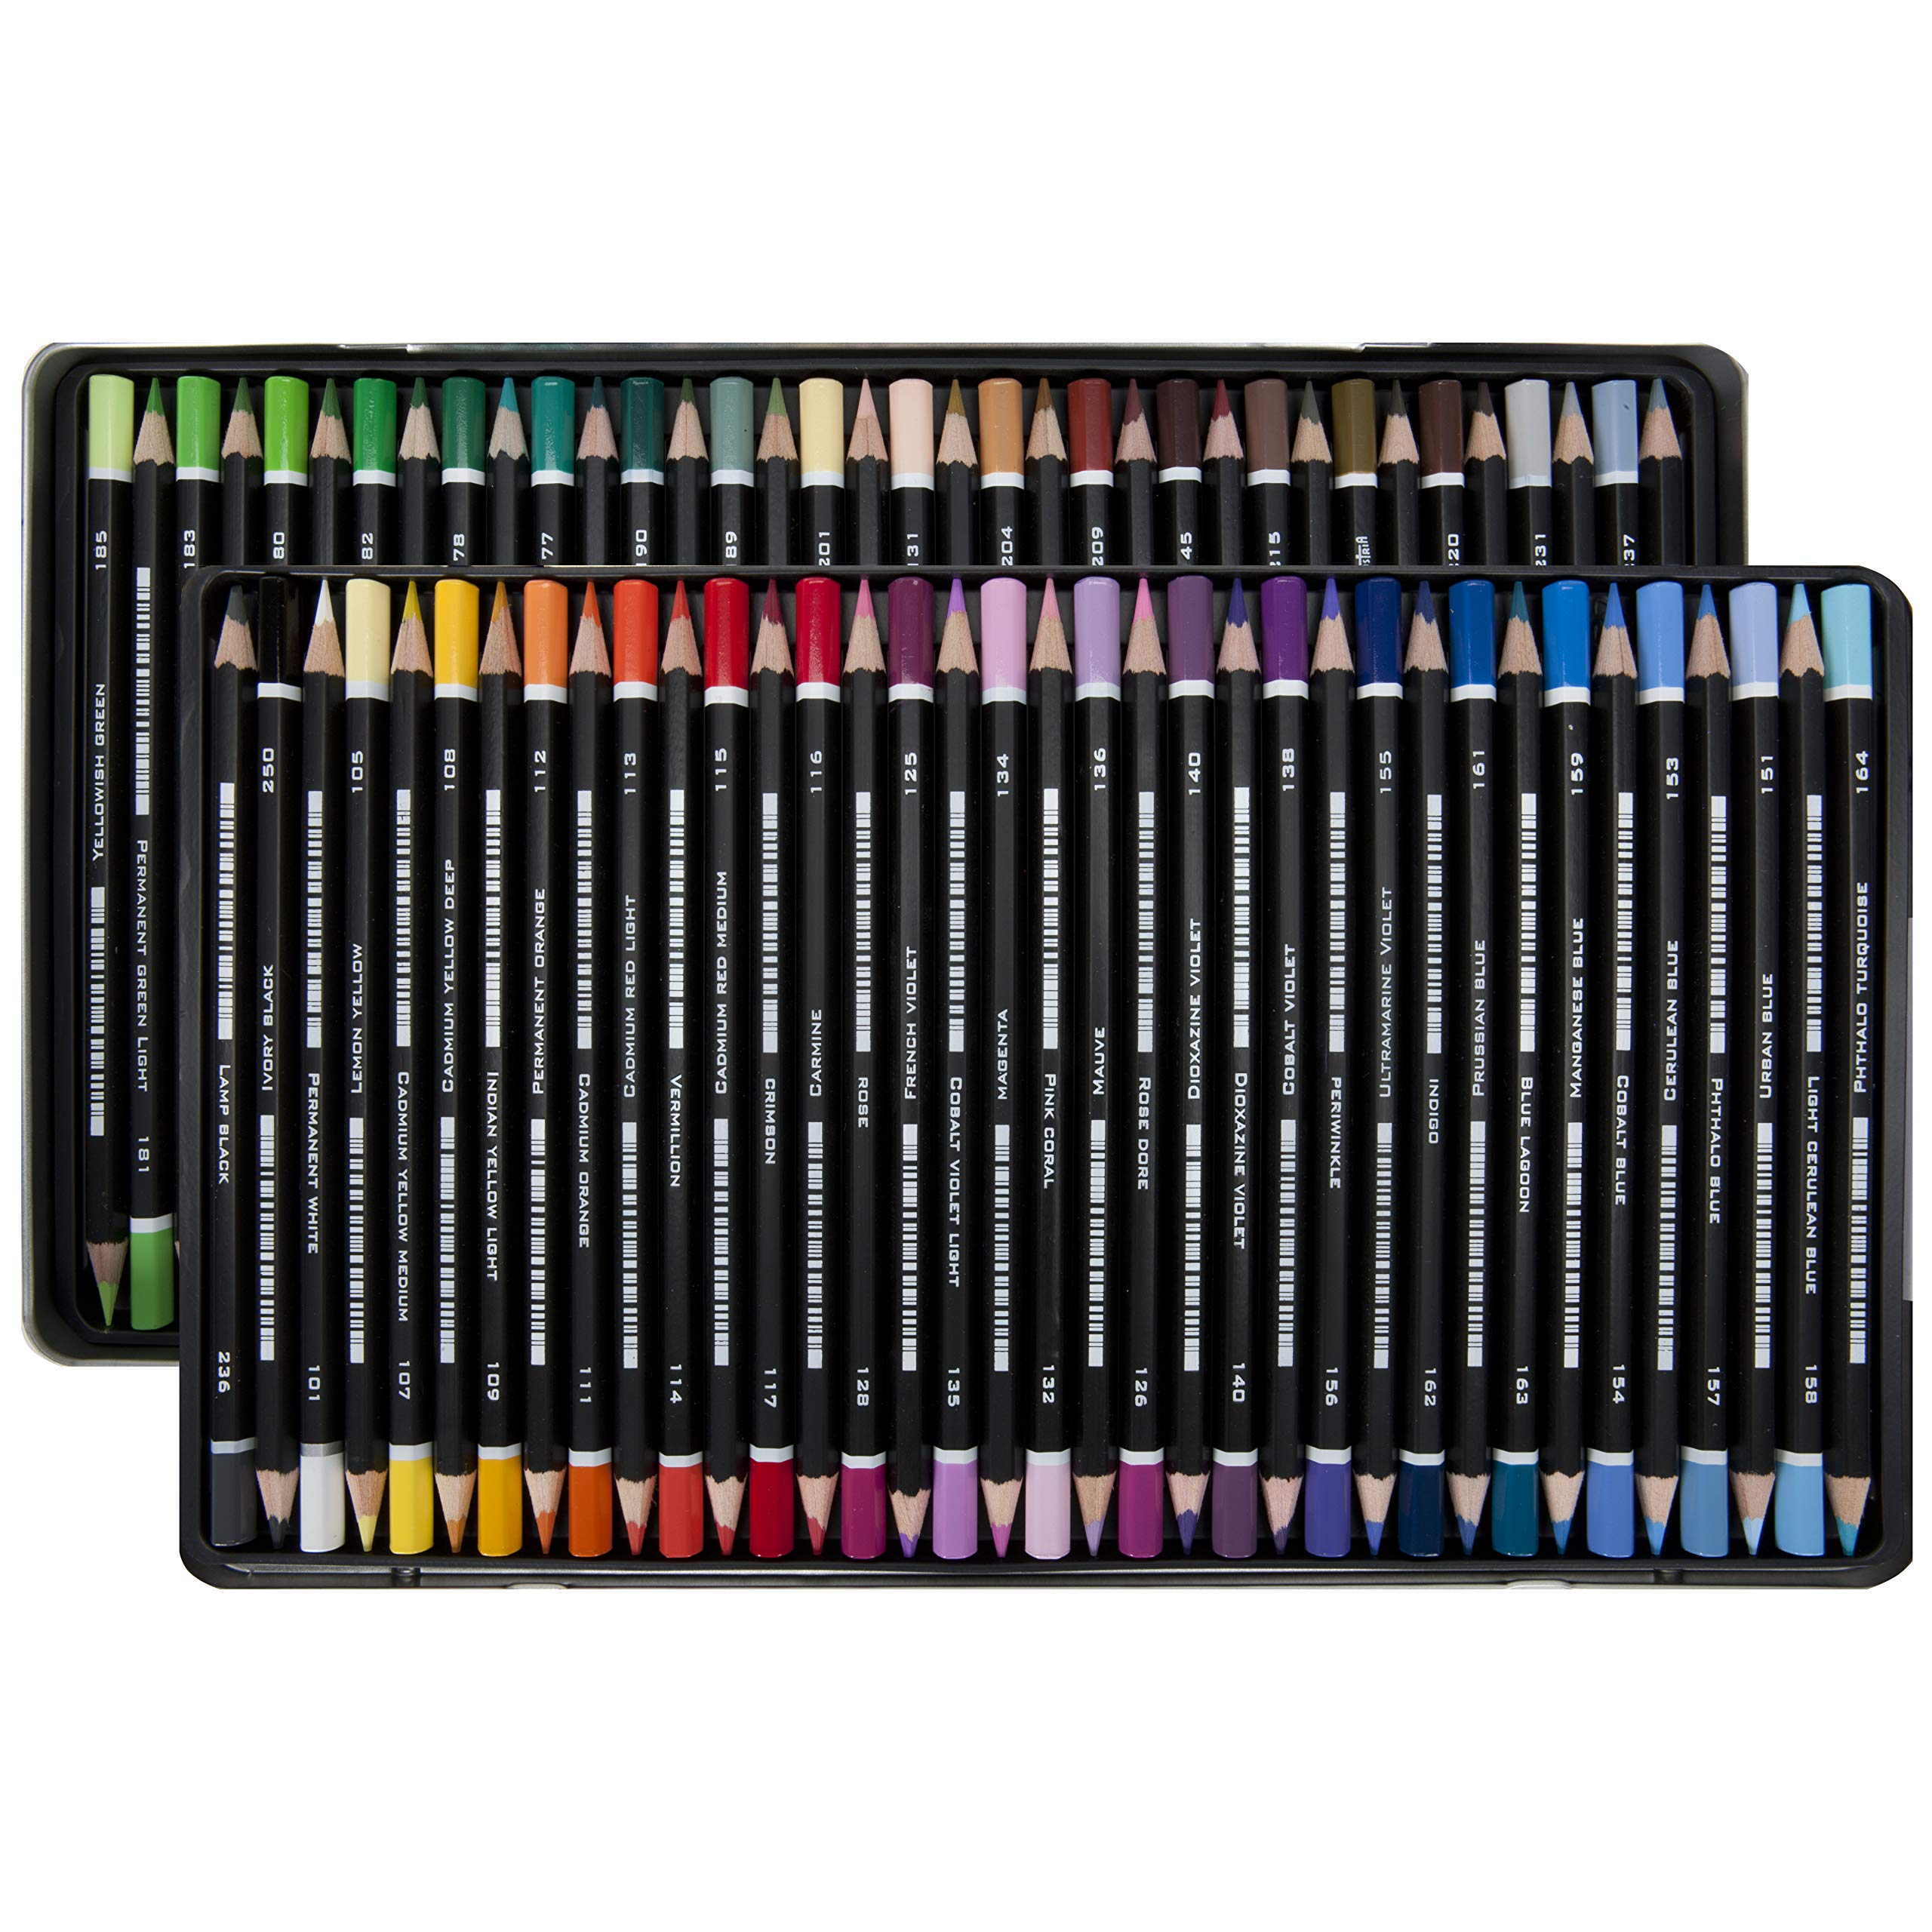 SoHo Urban Artist Professional Colored Pencil Set of 72 - Assorted Colors by Soho Urban Artist (Image #4)